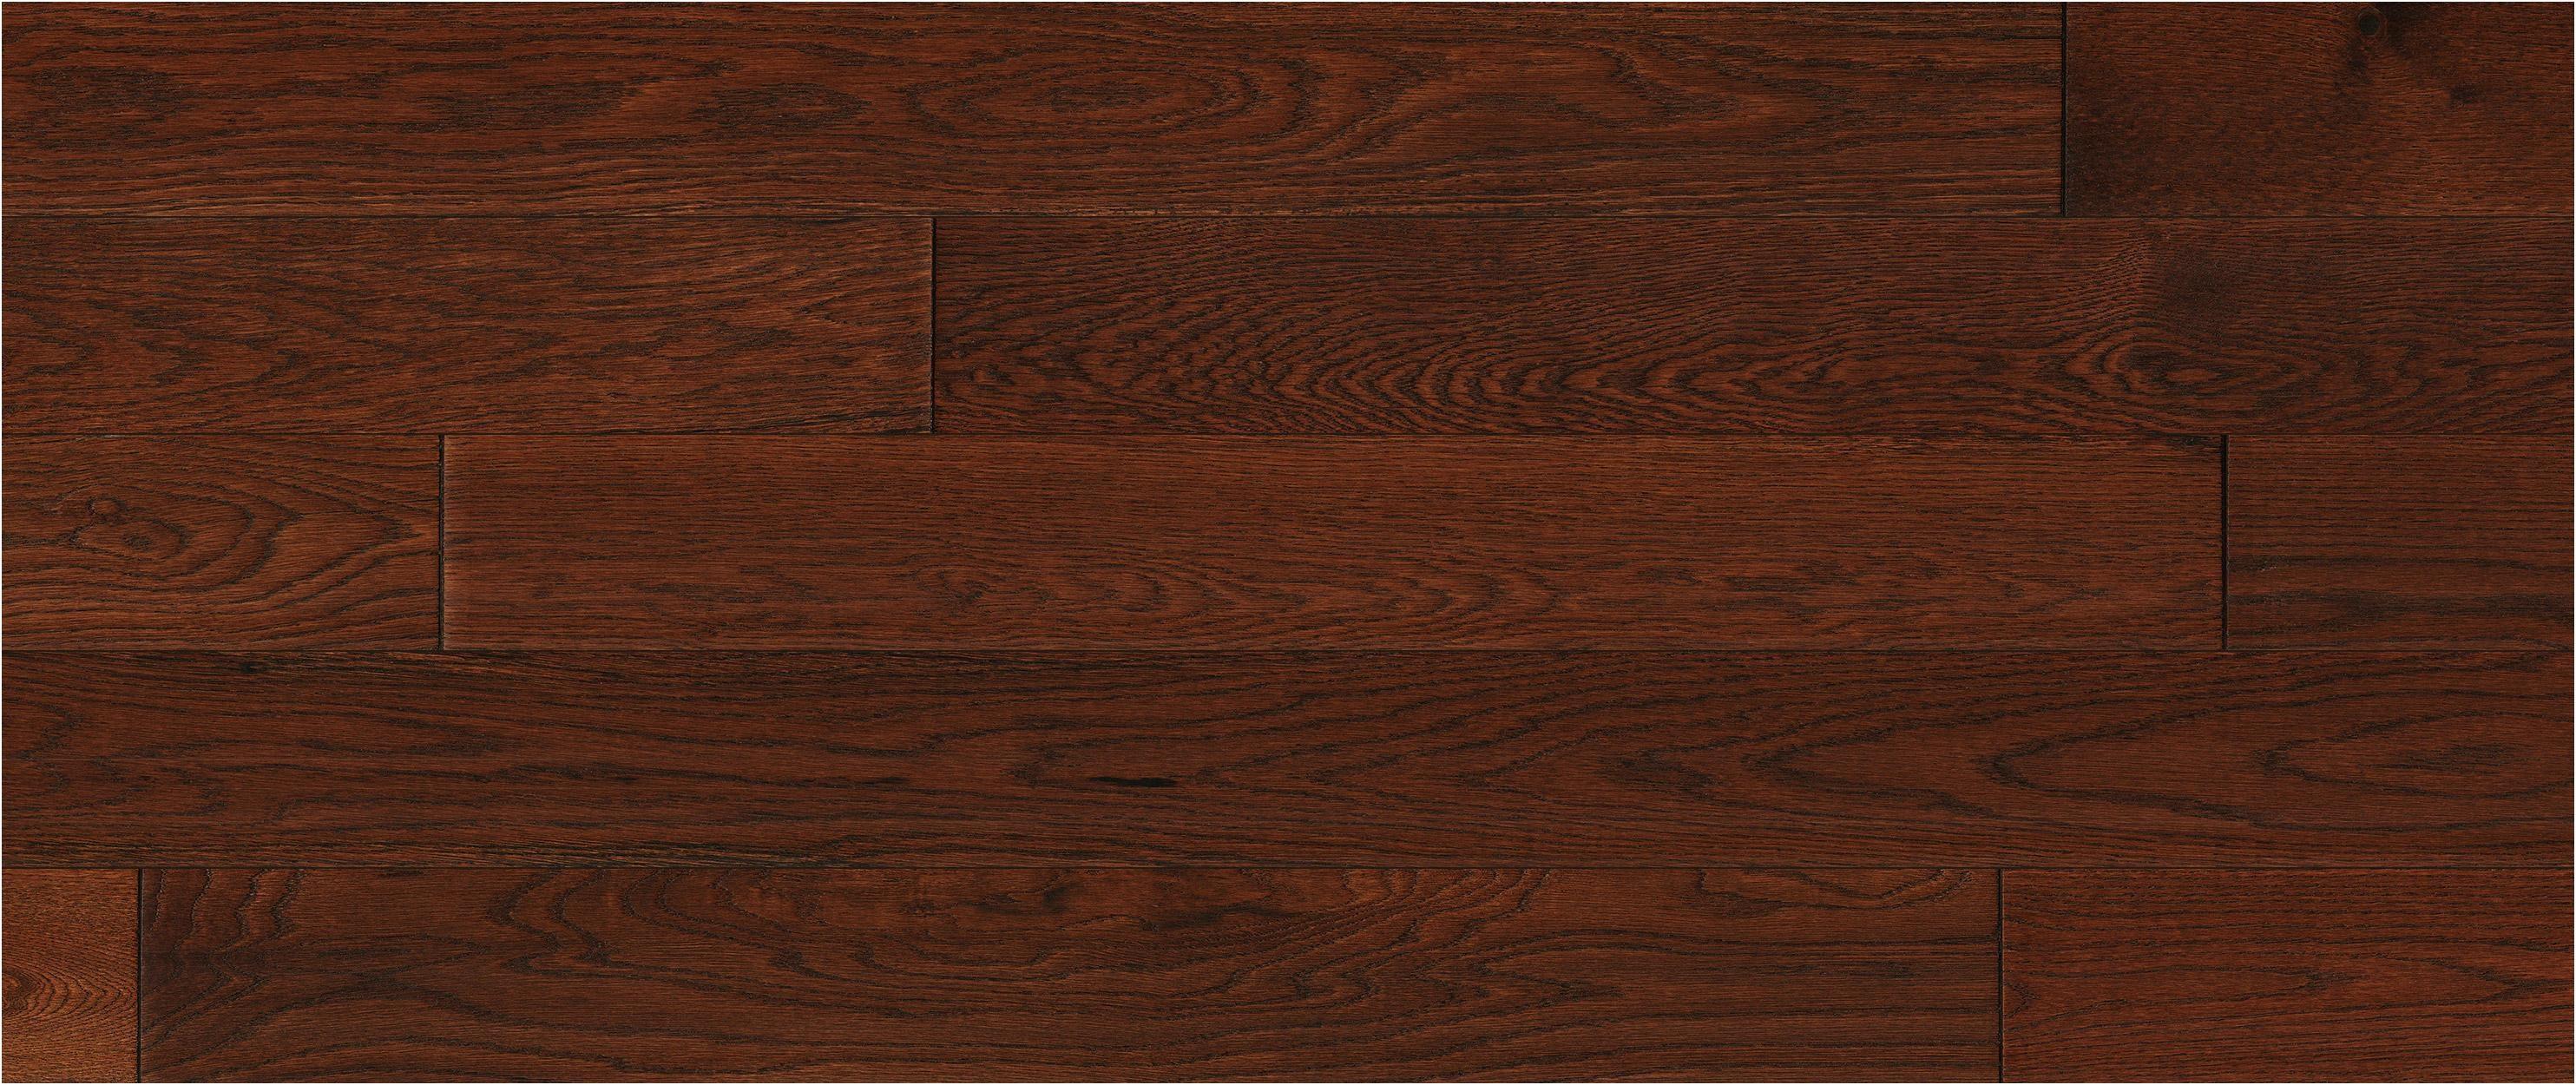 shaw hardwood flooring canada of hand scraped solid hardwood flooring inspirational shaw sequoia with hand scraped solid hardwood flooring luxury timber hardwood white oak sorrell 5 wide solid hardwood